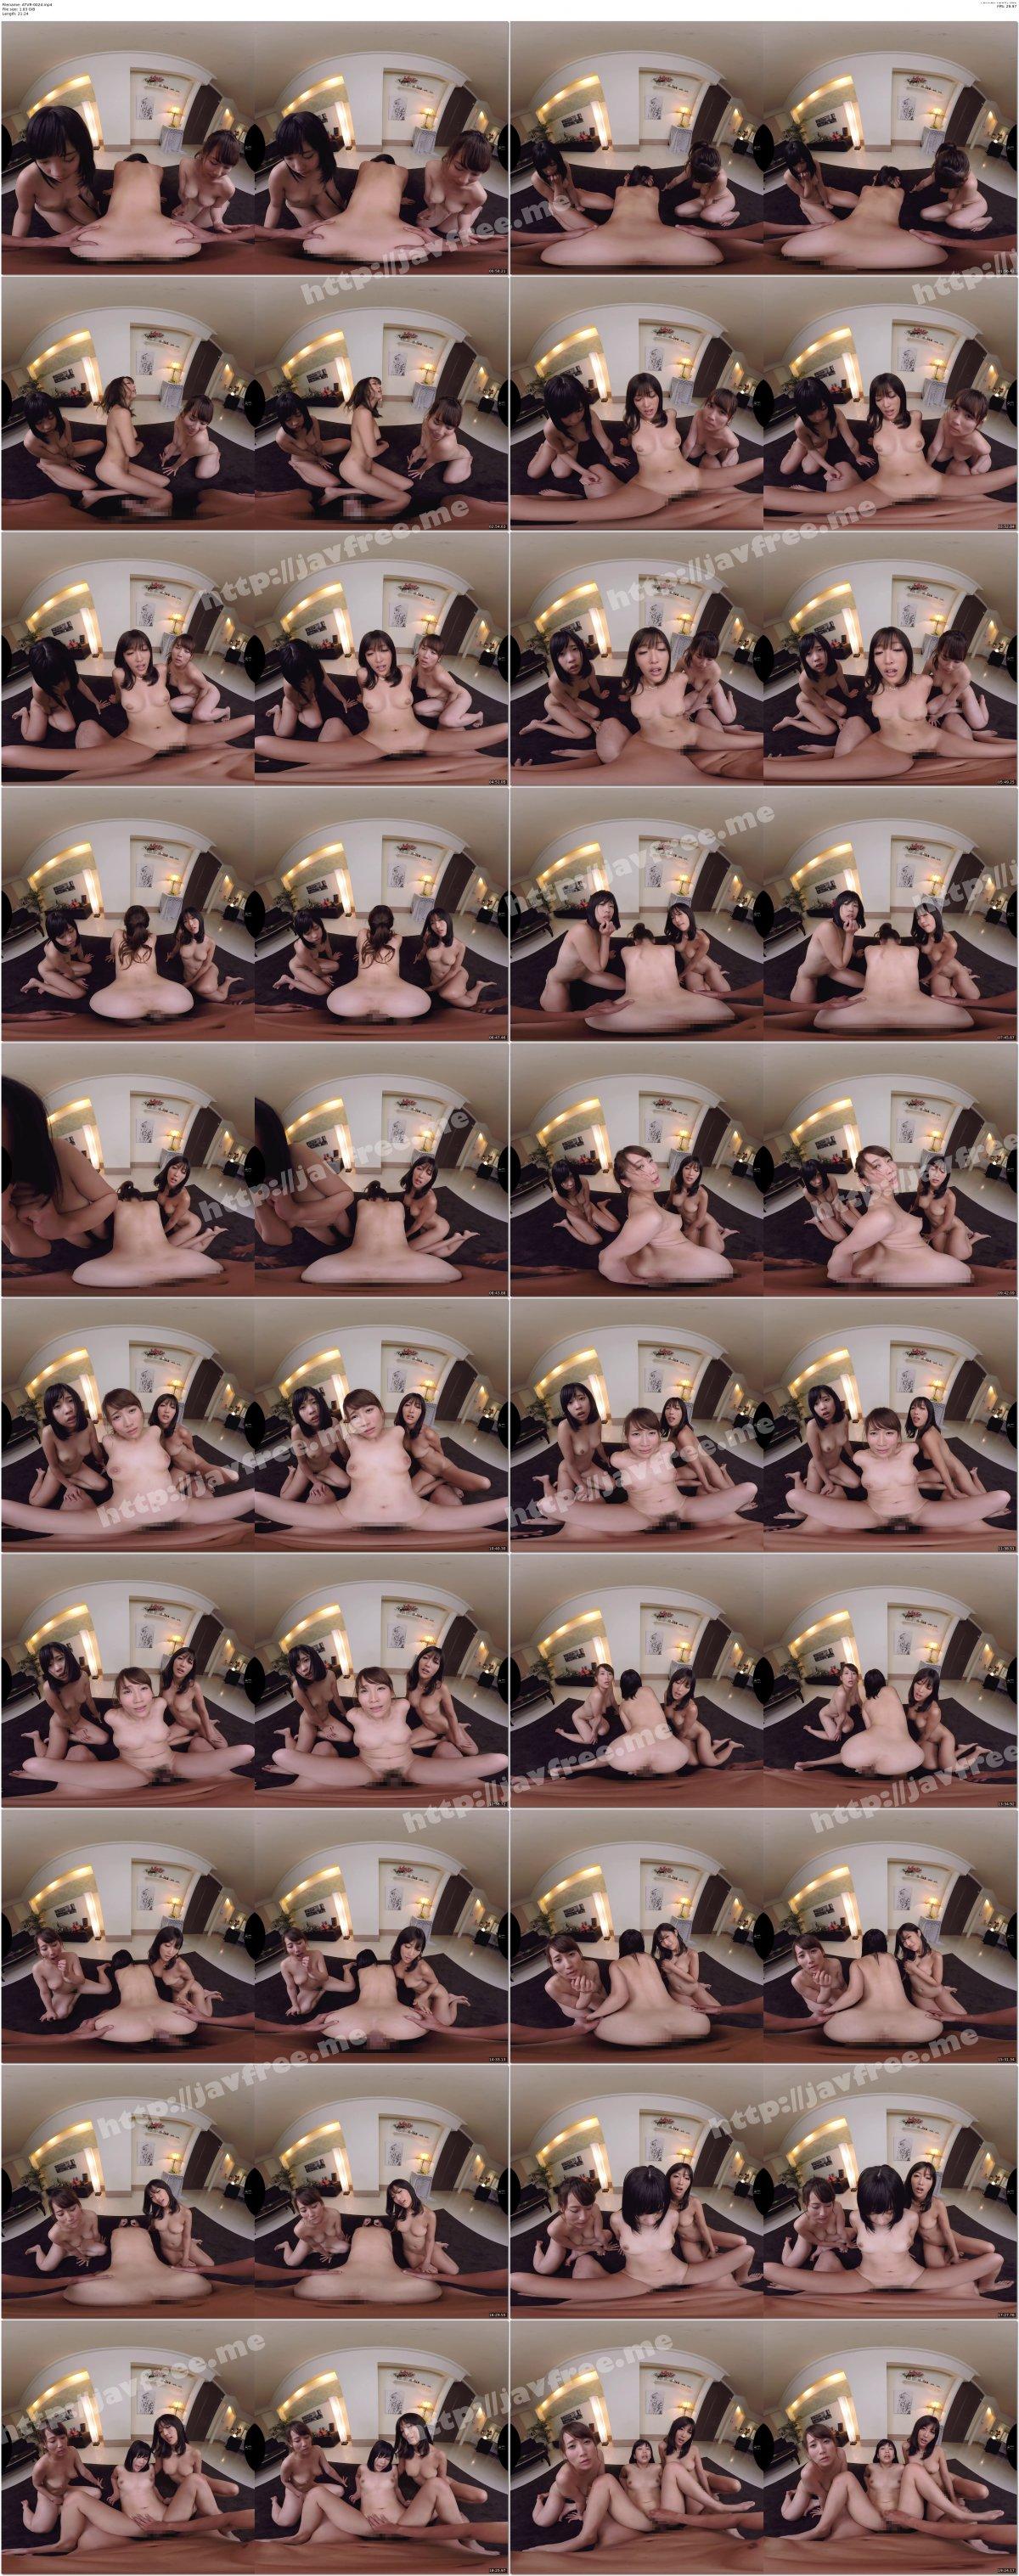 [ATVR-002] 【VR】調教した美女3人があなたを奪い合う夢のハーレム性奴隷生活 - image ATVR-002d on https://javfree.me